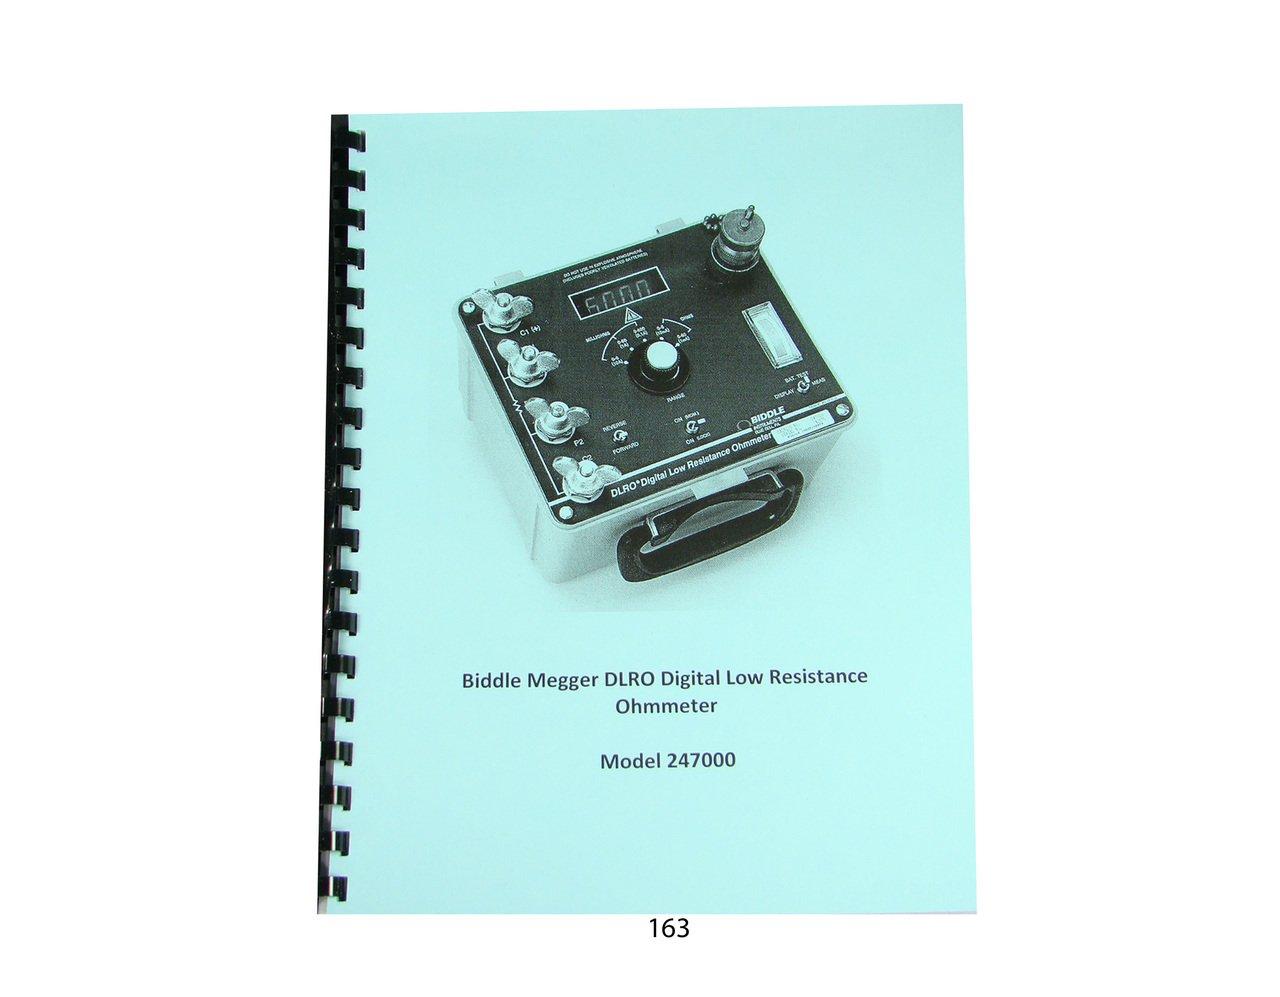 Biddle DLRO 247000 Digital Low Resistance Ohmmeter Manual